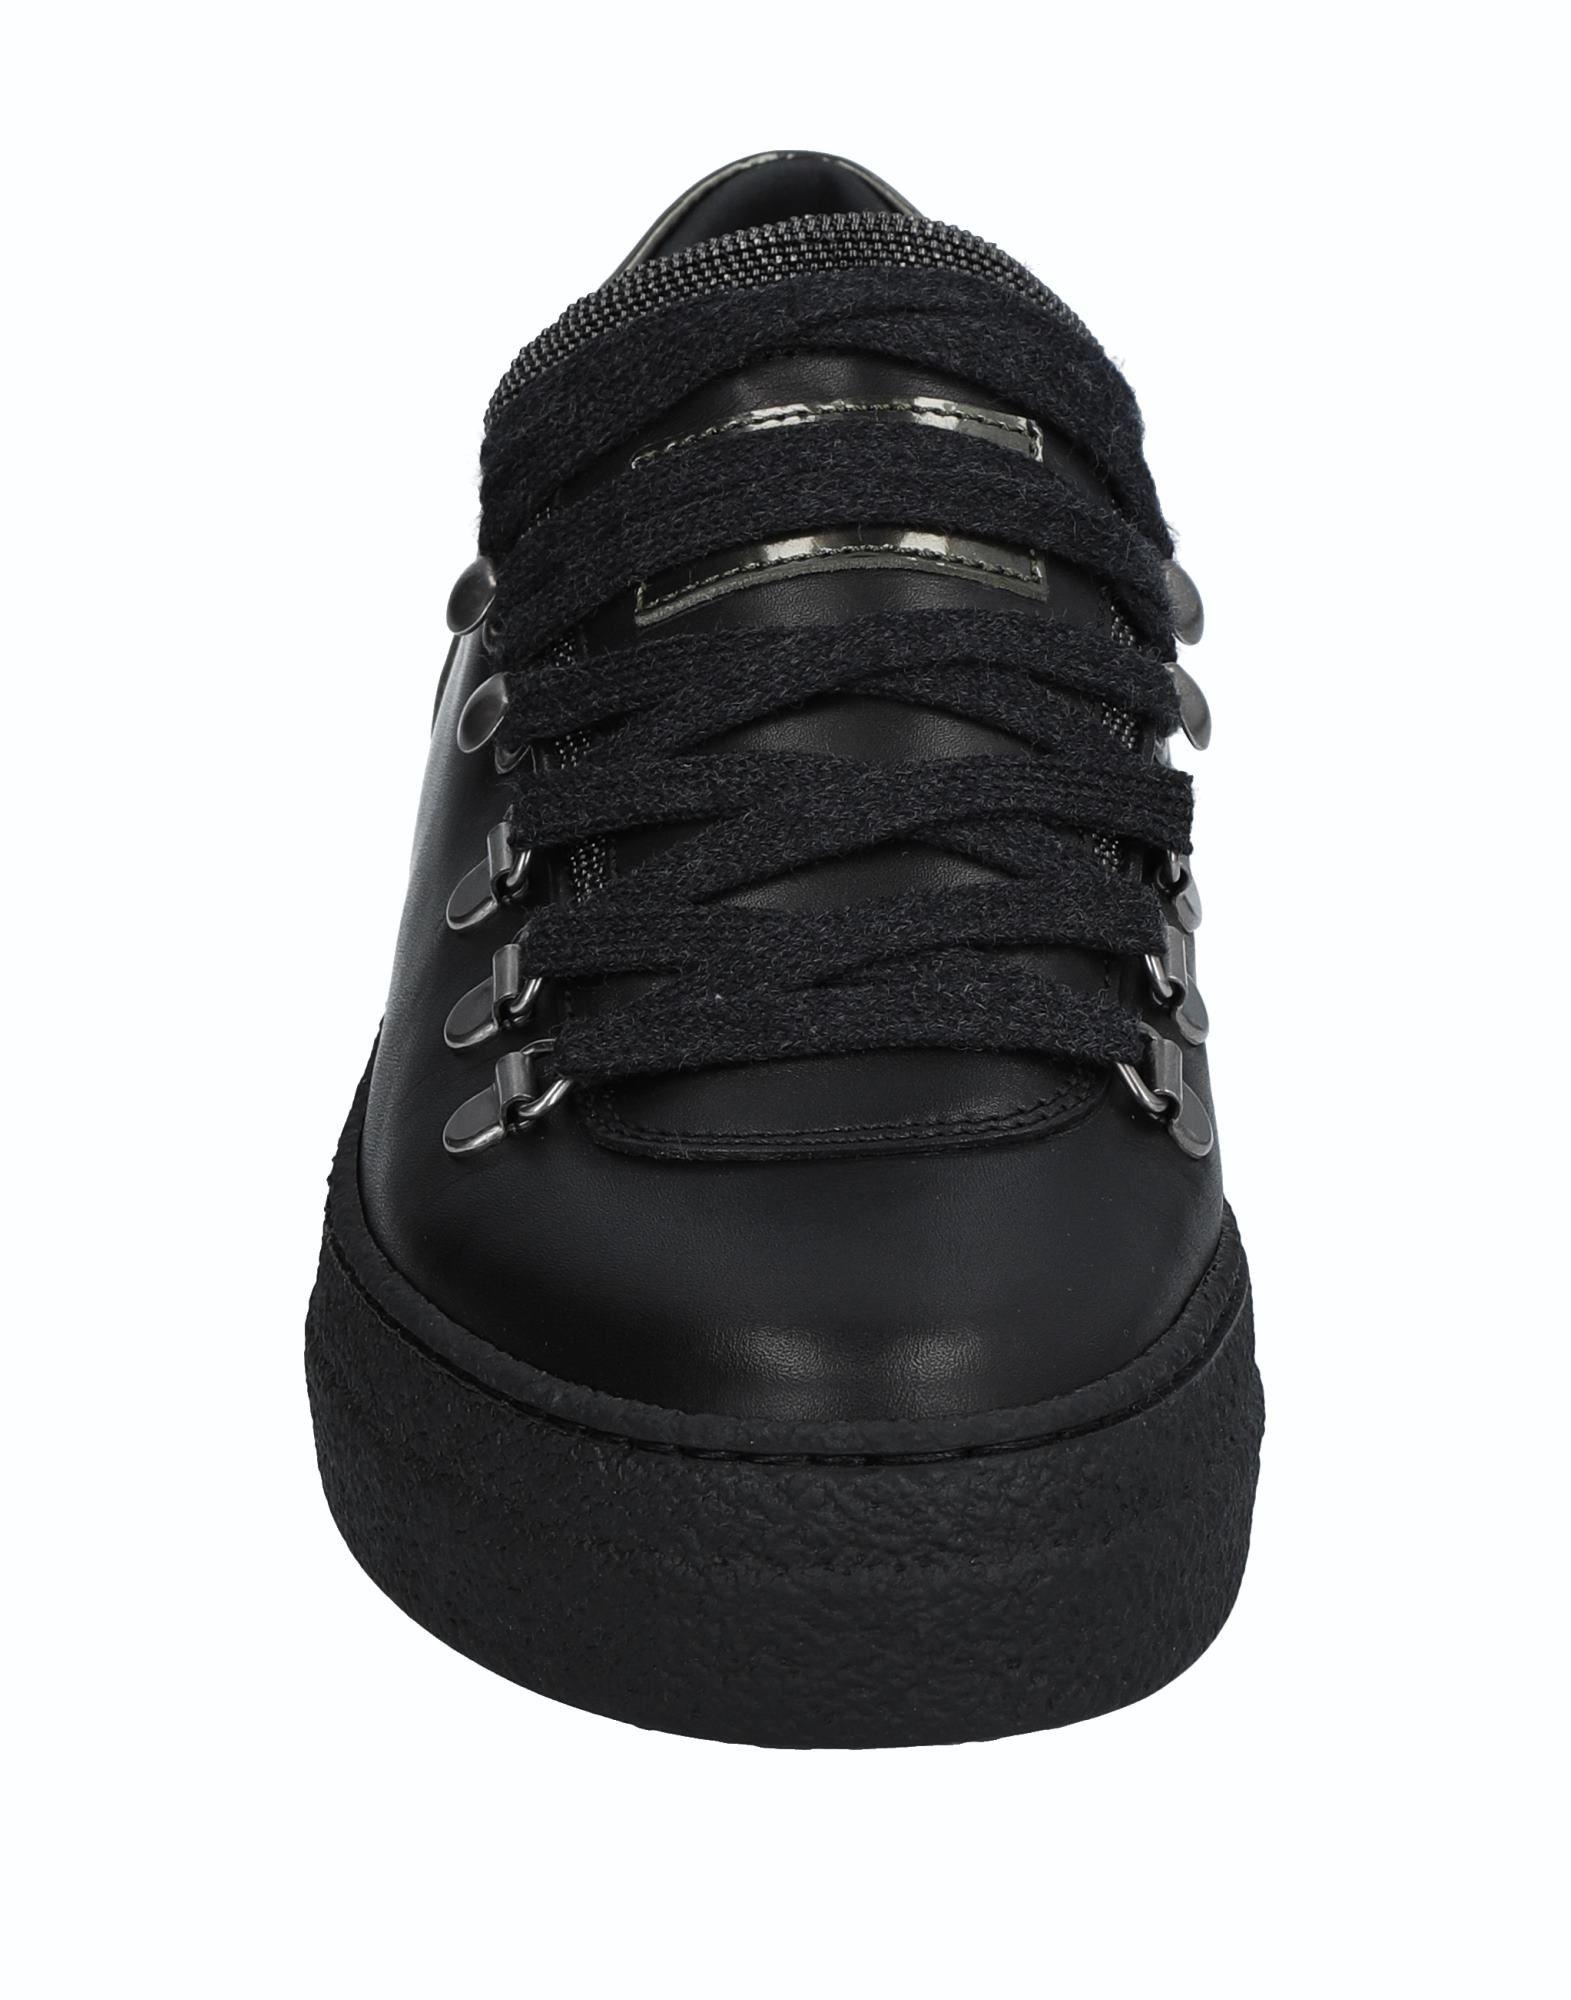 Brunello Cucinelli Sneakers Schuhe Damen  11516090WP Neue Schuhe Sneakers a953b3